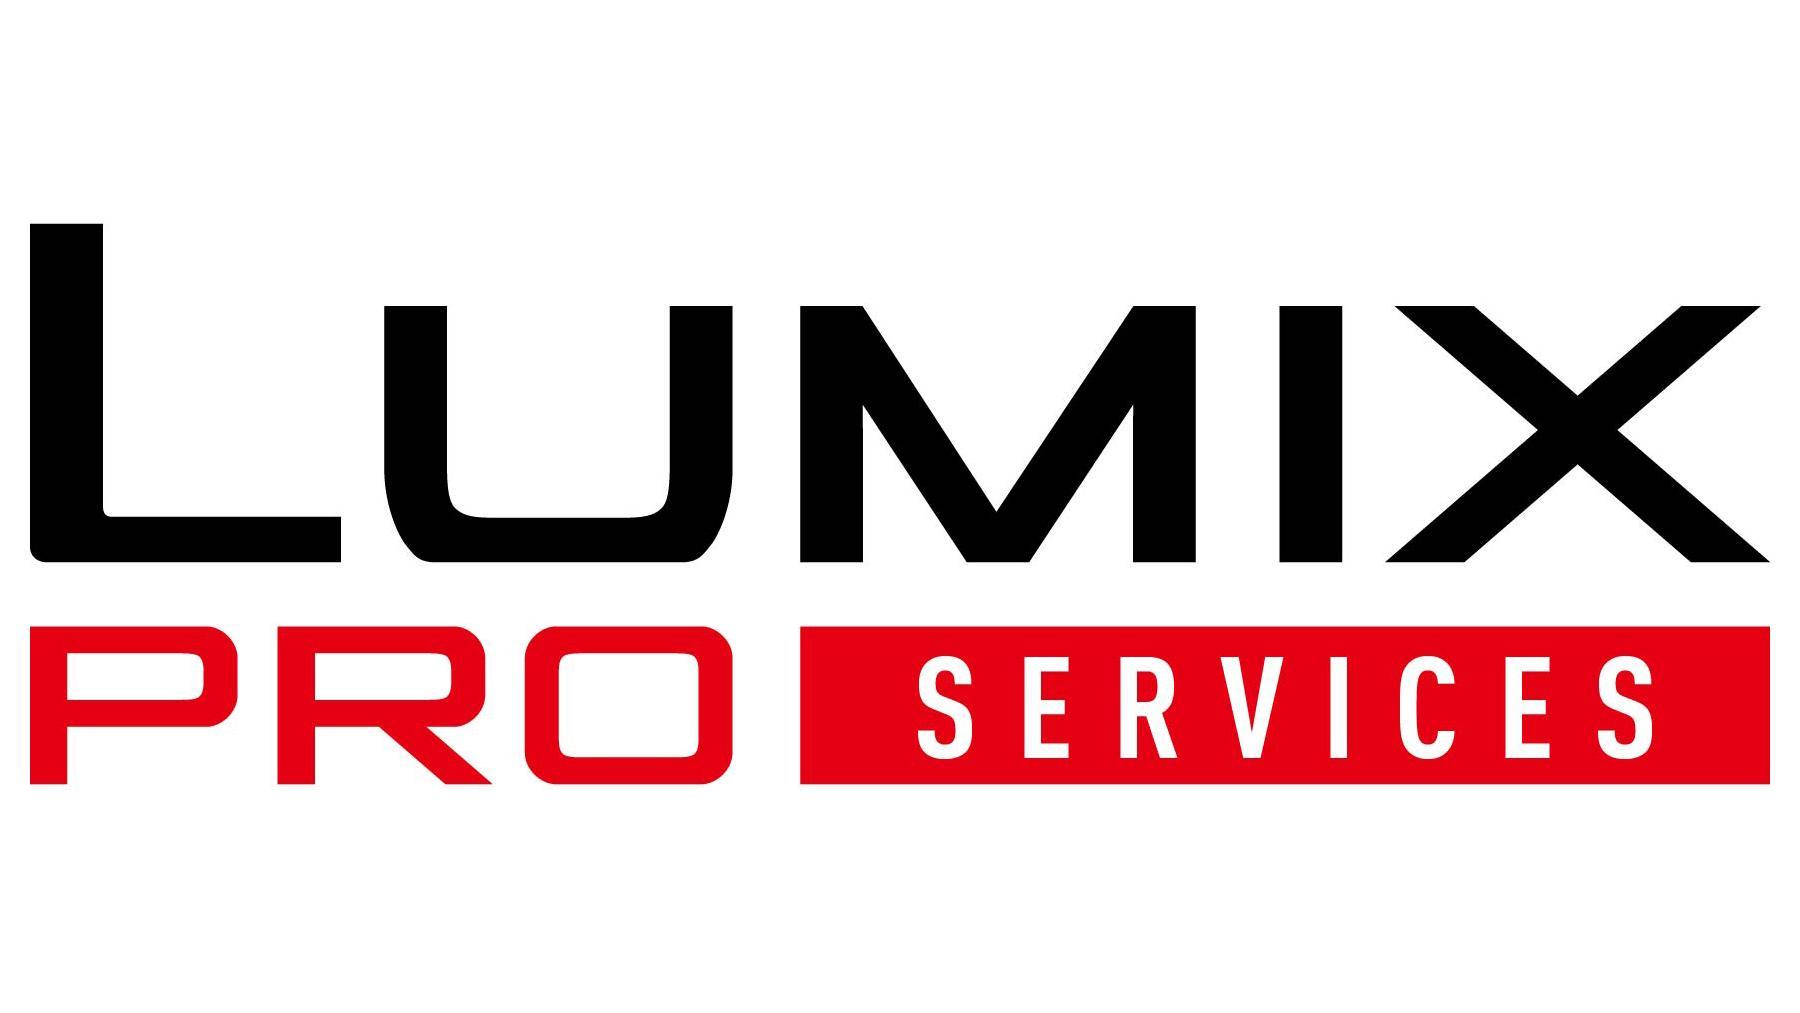 photo: LUMIX PRO services logo